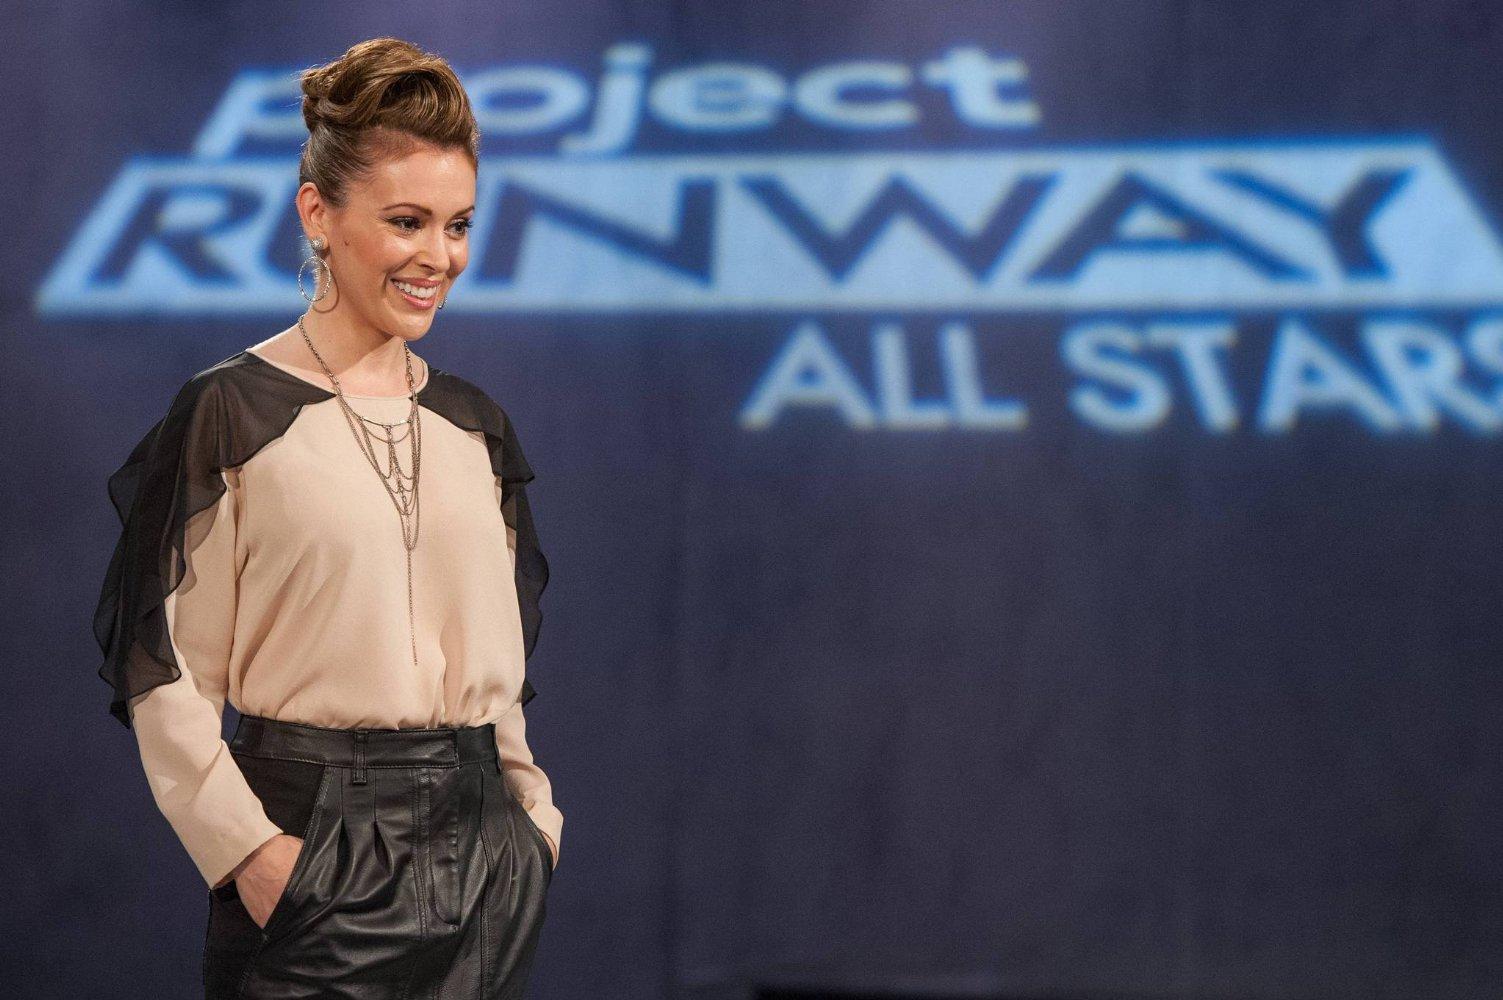 Project Runway All Stars Season 6 2